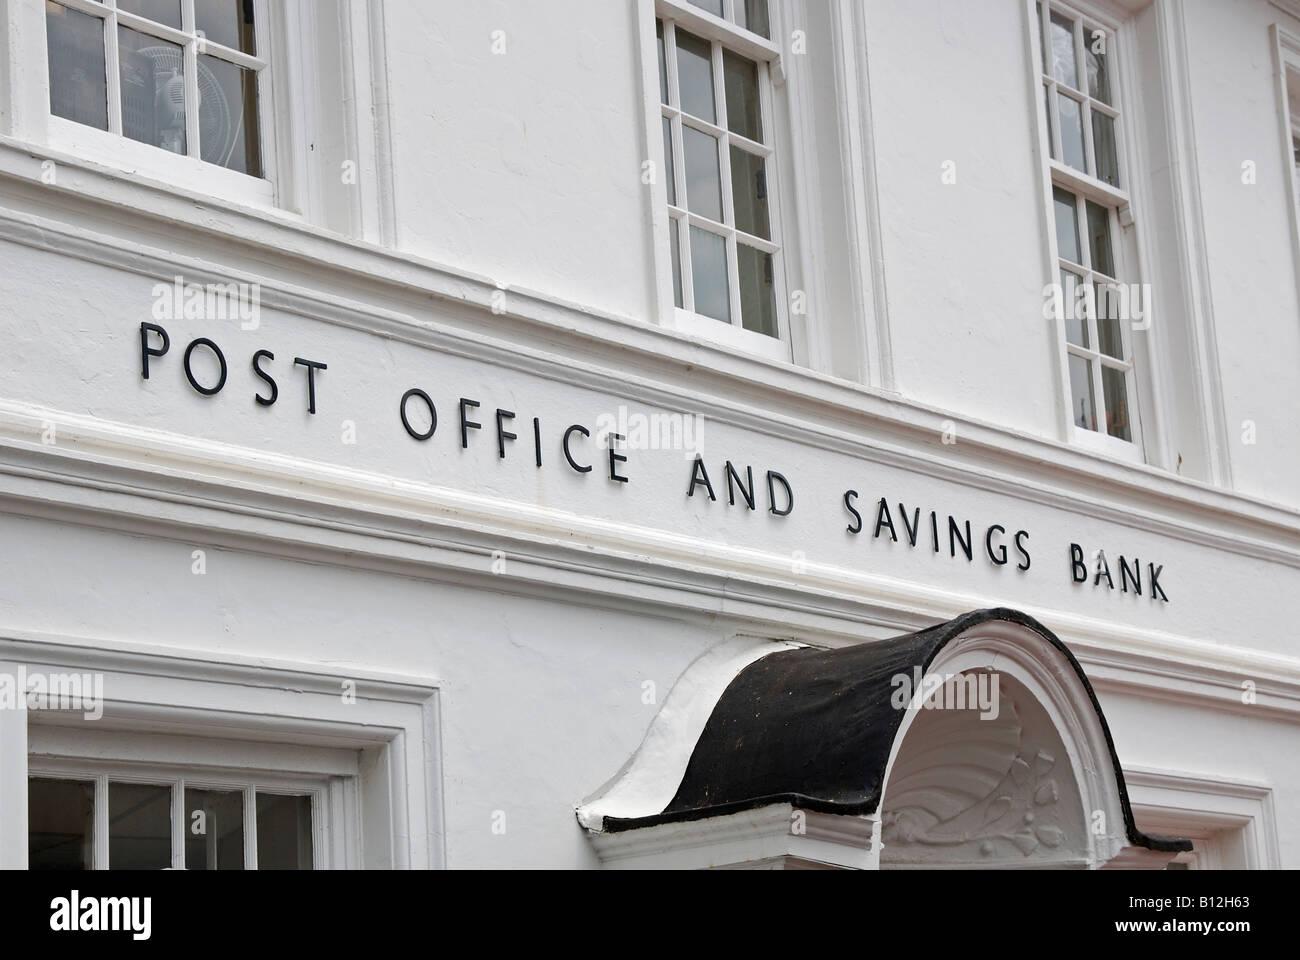 dapto post office. Post Office Bank Stock Photos \u0026 Images - Alamy Dapto